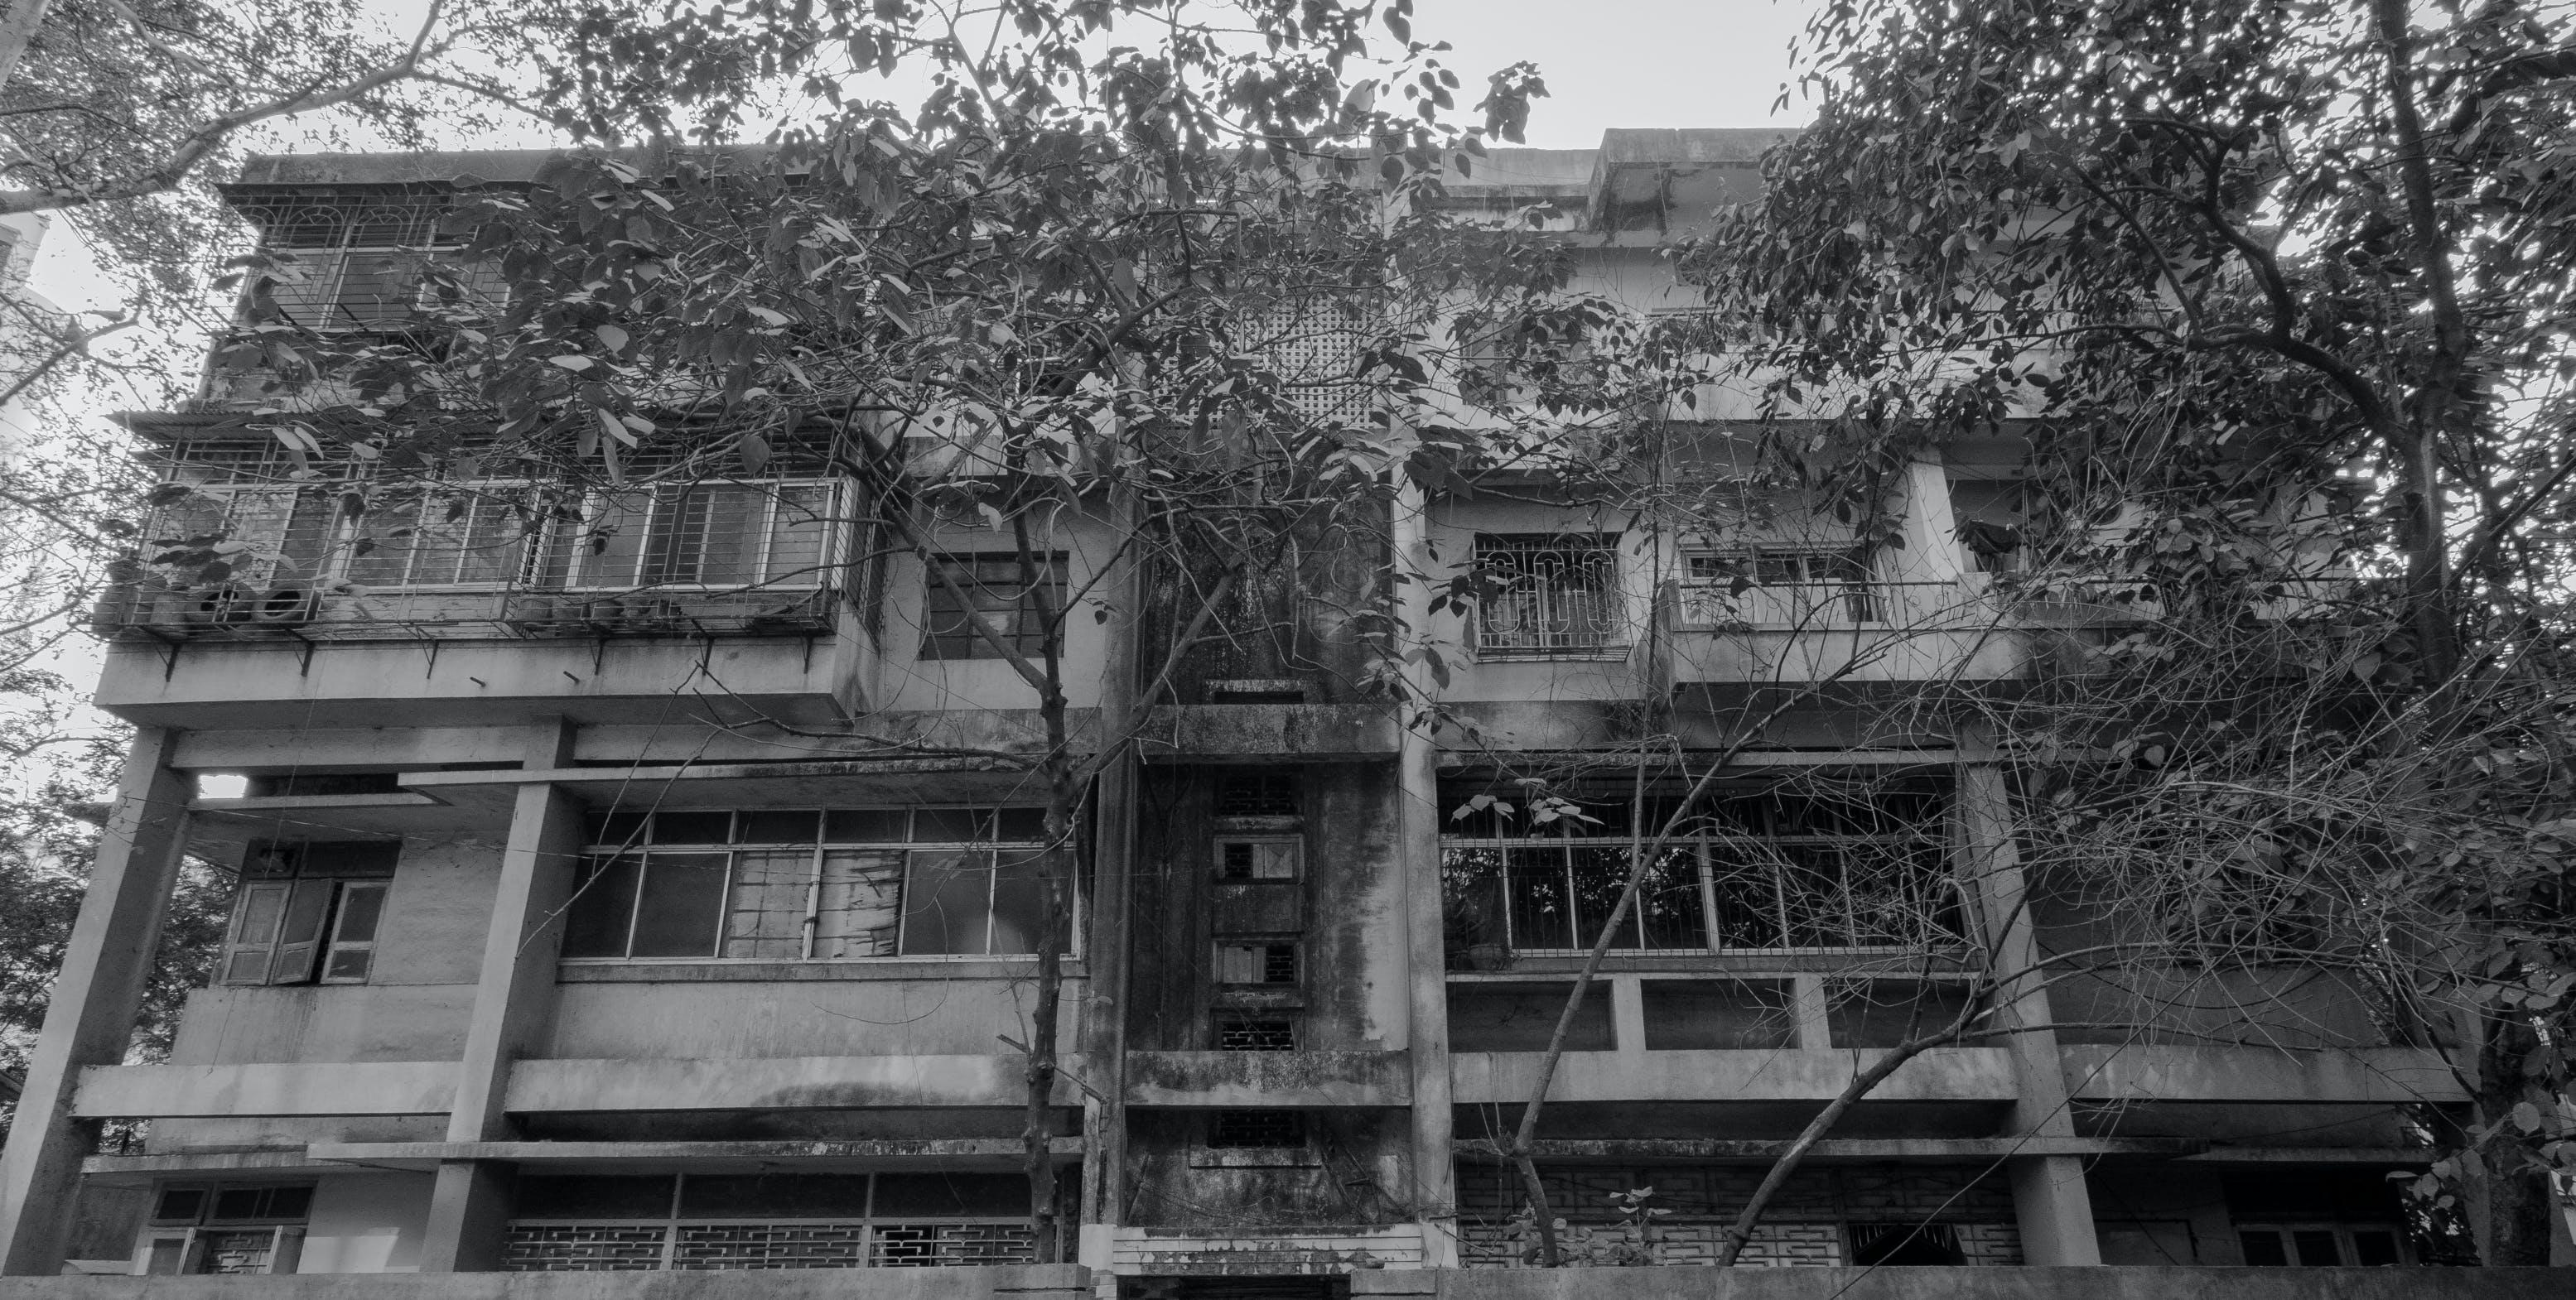 Bramha Darshan Residential